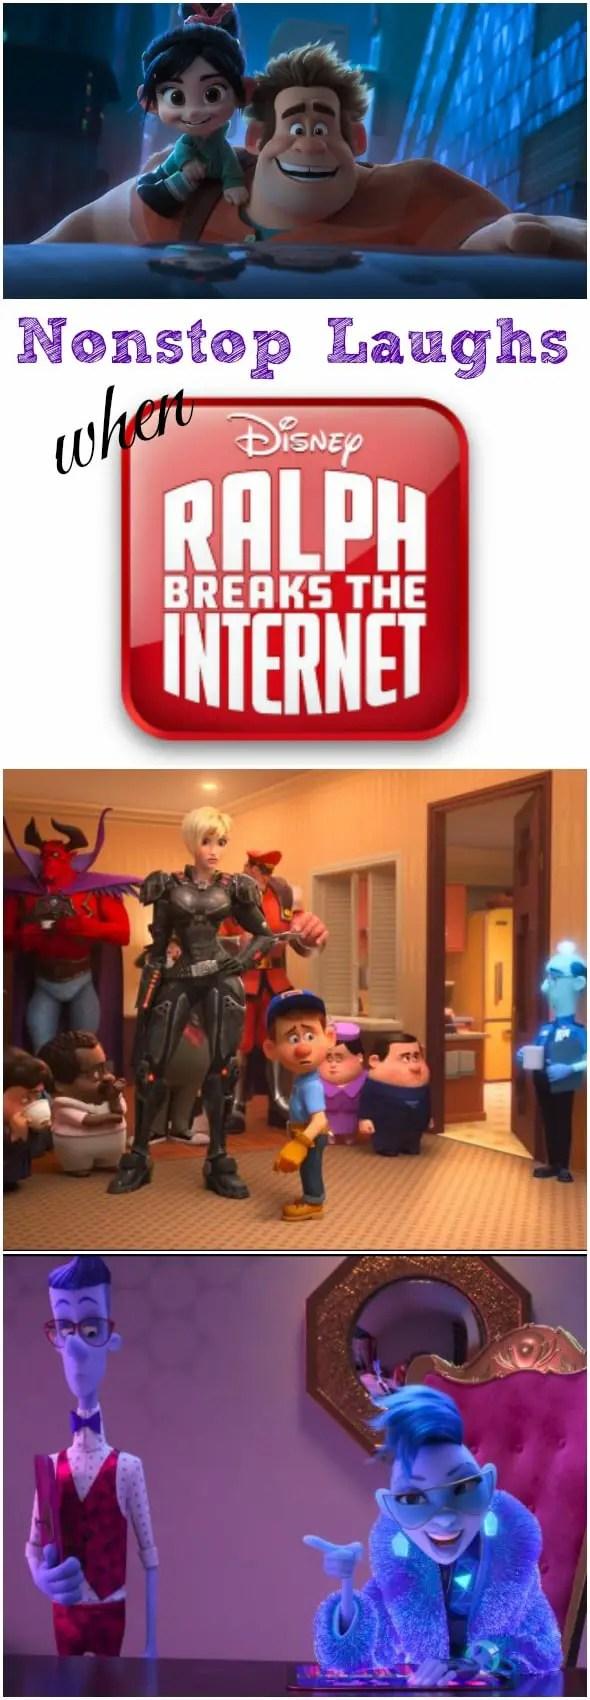 Nonstop Laughs when Ralph Breaks the Internet #disney #RalphBreaksTheInternet #movie #comingsoon